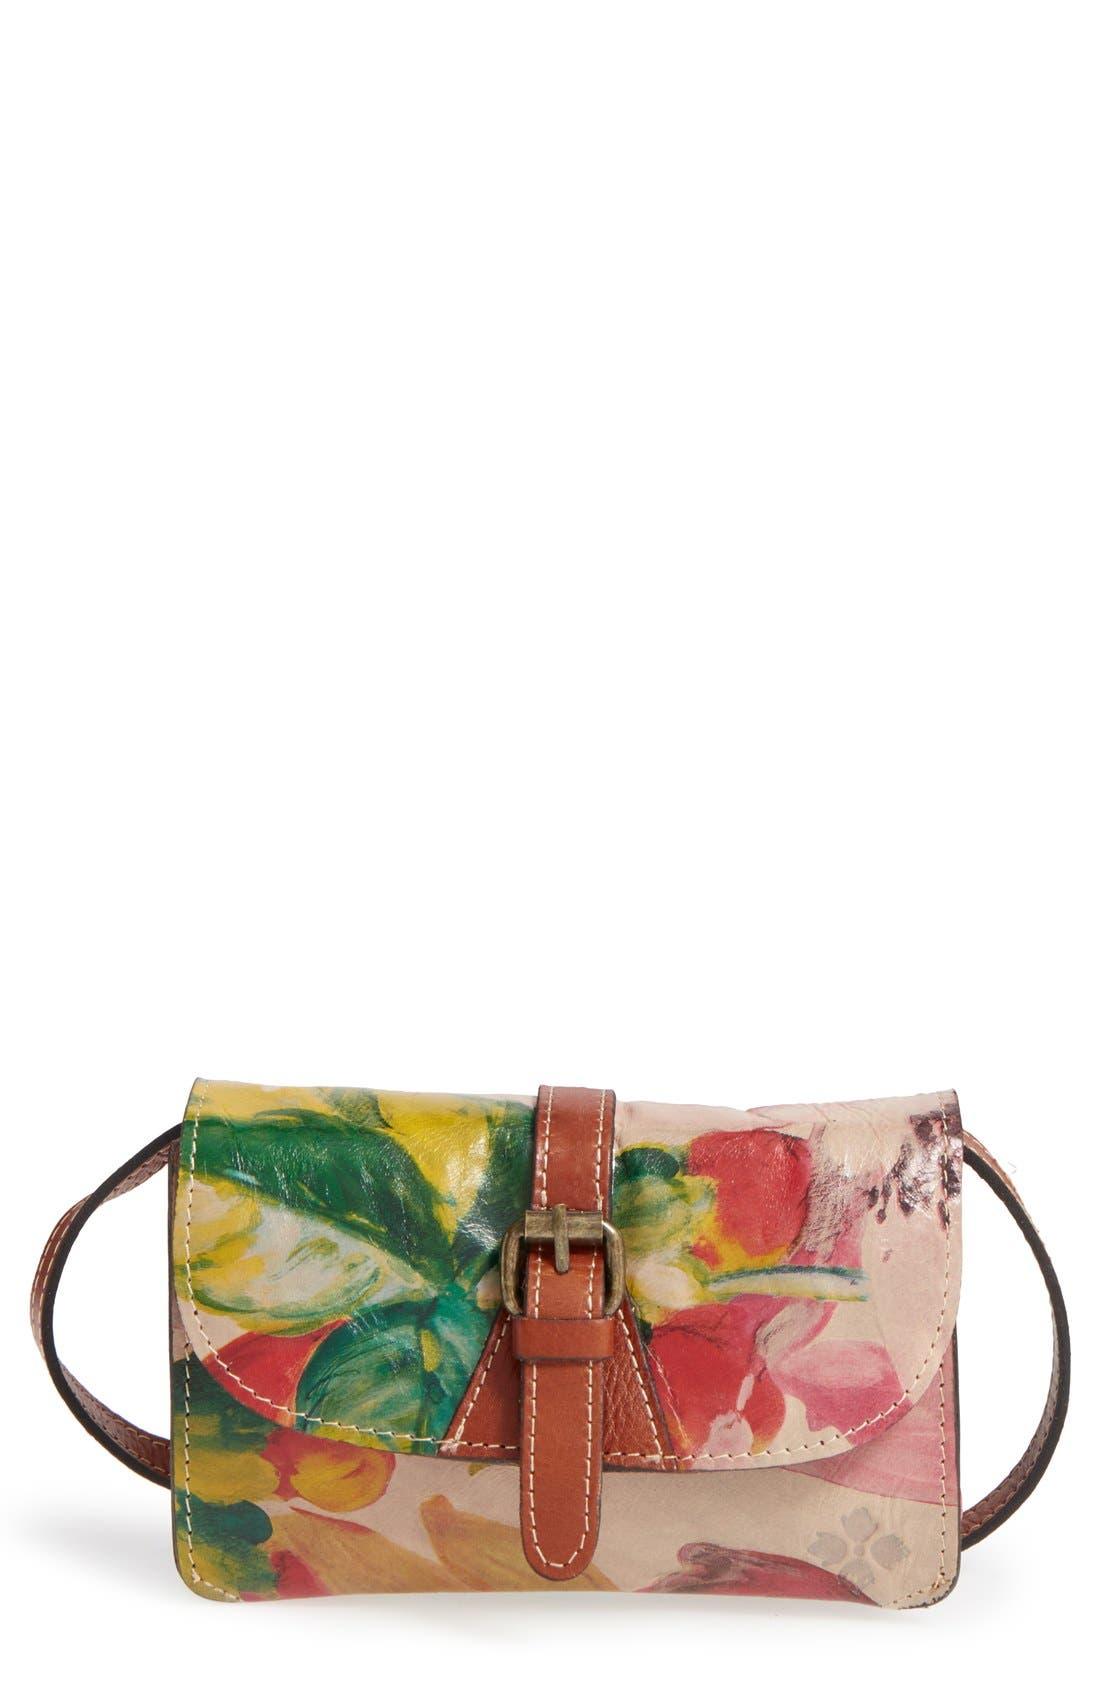 Alternate Image 1 Selected - Patricia Nash 'Torri' Italian Leather Crossbody Bag